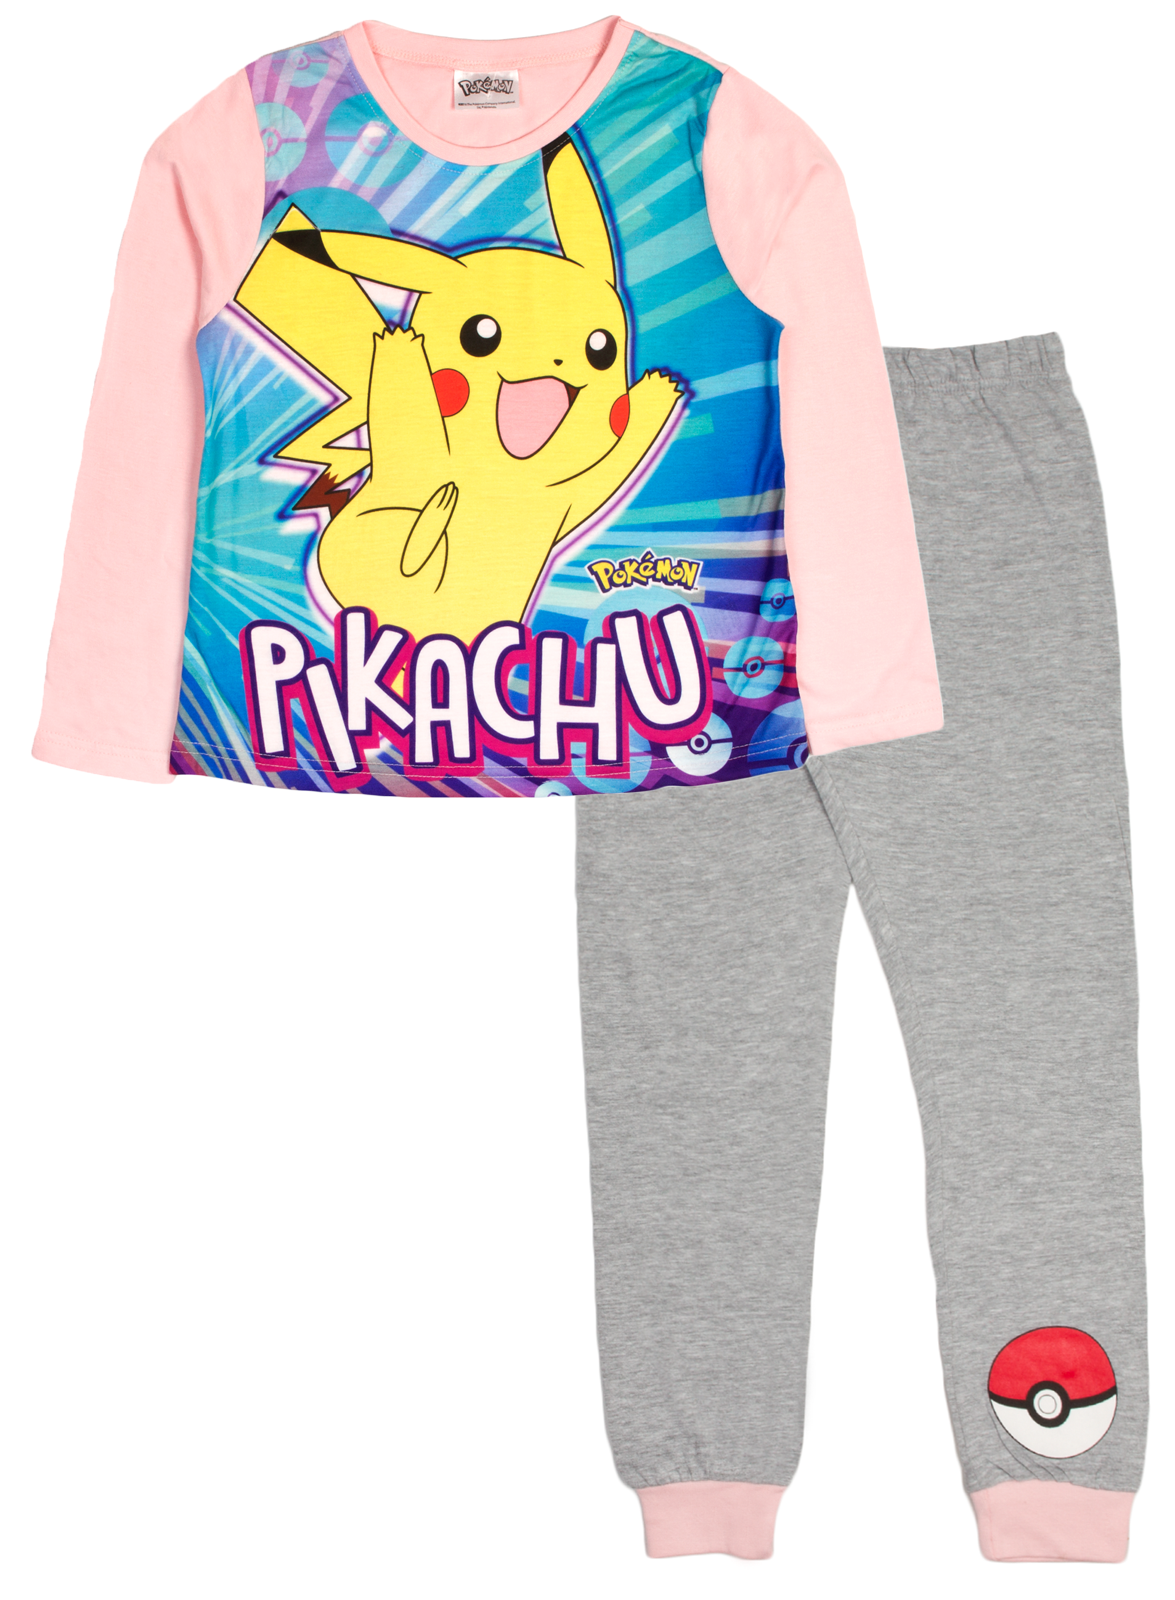 Girls Pokemon Go Pyjamas Full Length Pikachu Pjs 2 Piece Pyjama Set Kids  Size - PNG Pyjamas